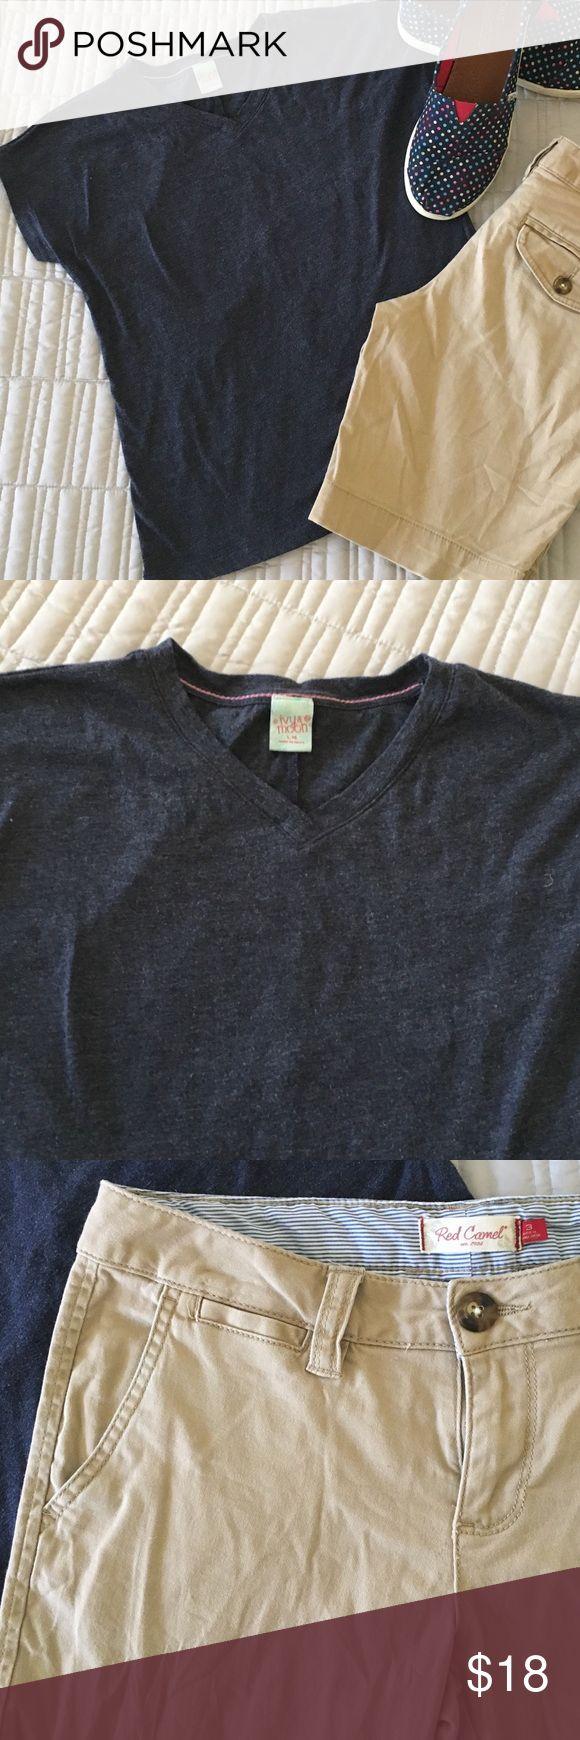 "Navy T-Shirt  & Khaki Shorts - Girls Navy Ivy & Moon T-shirt from Nordstrom, size L/14 & Khaki Red Camel Shorts, size 3, 9"" inseam. Other"